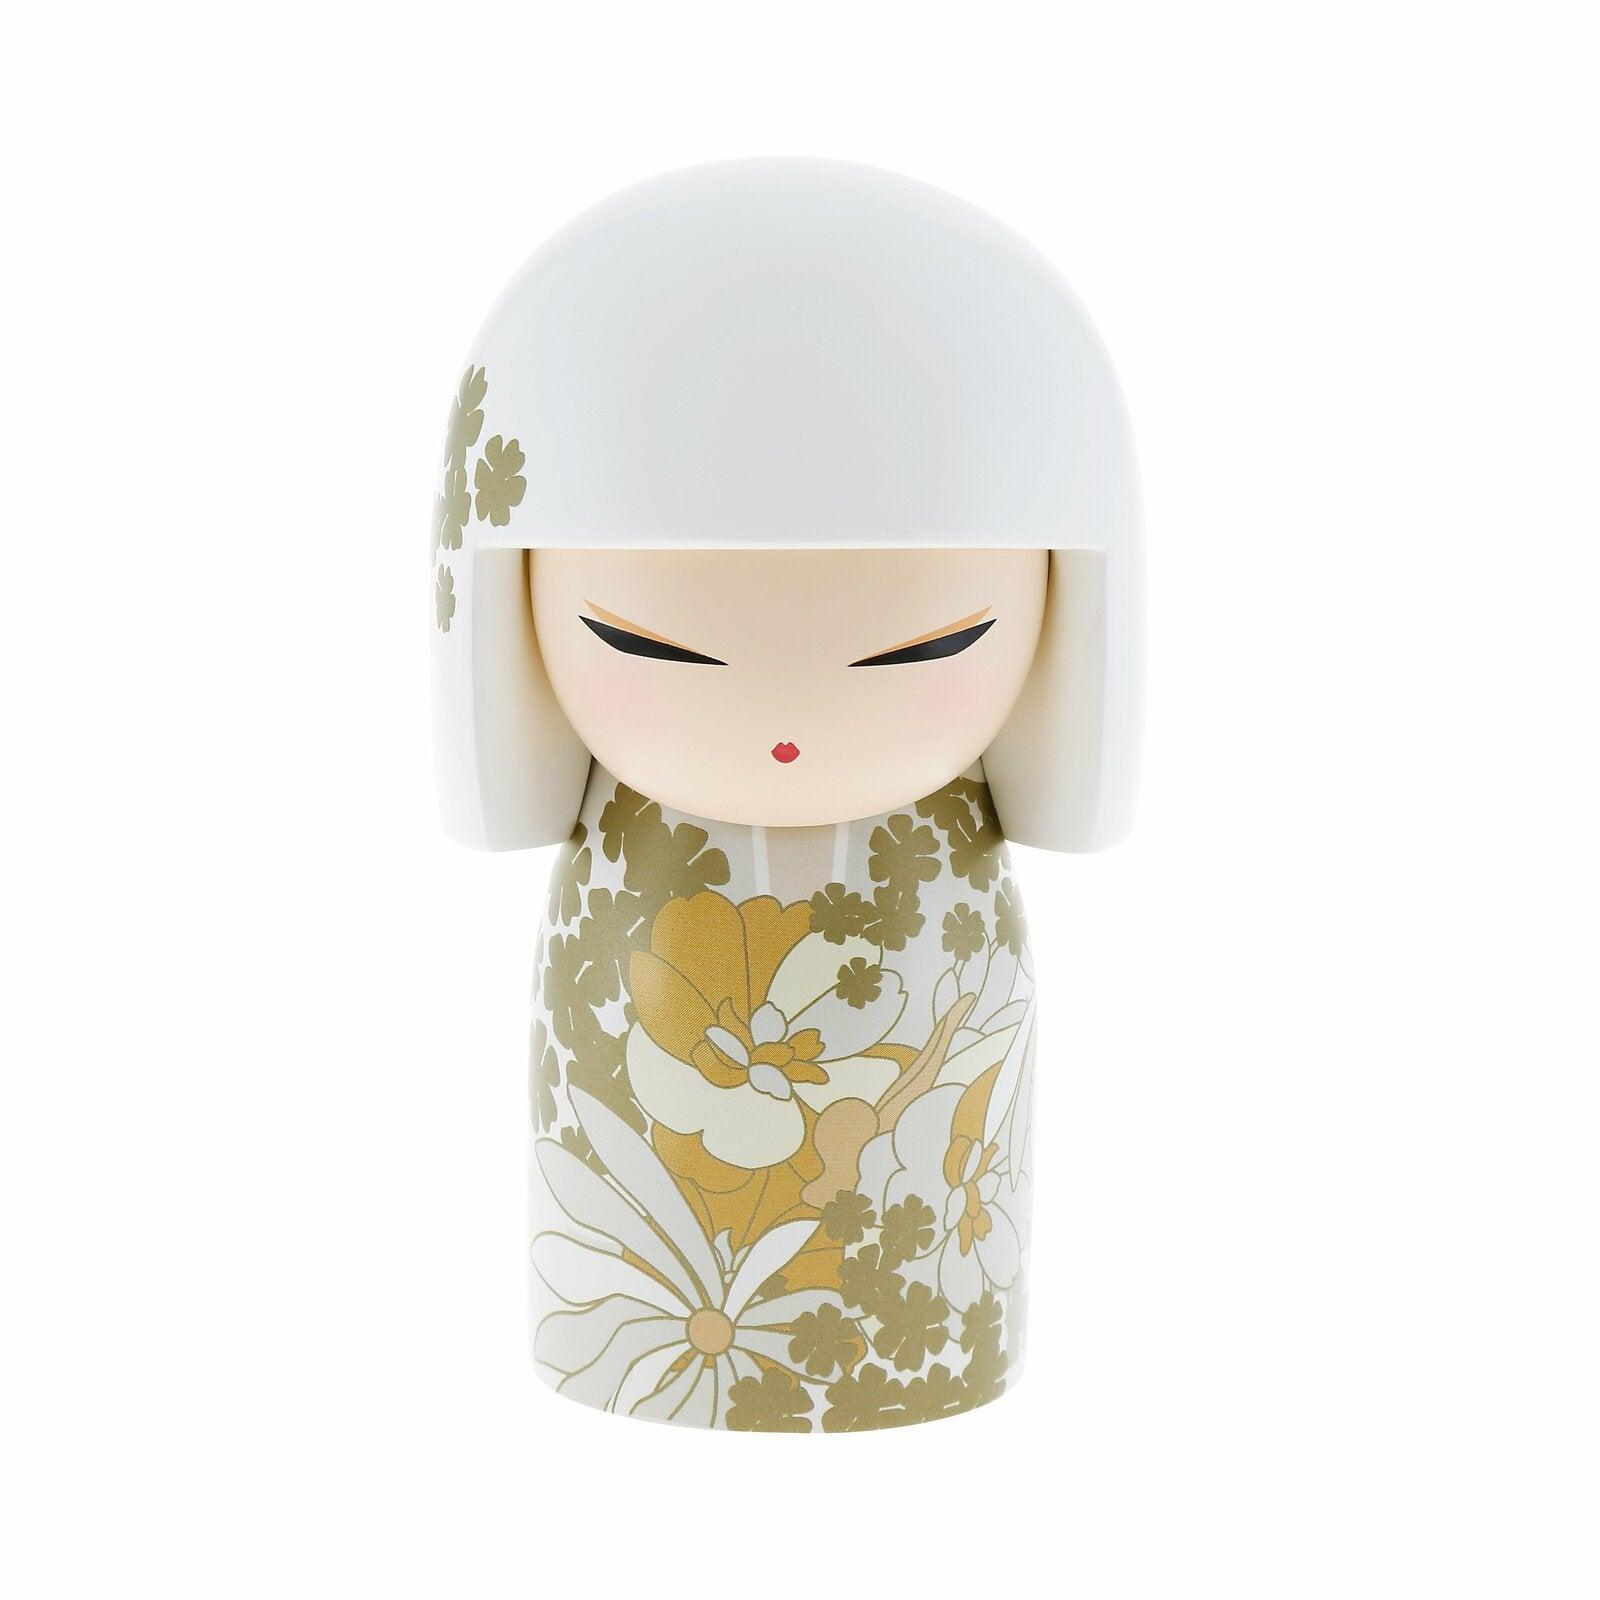 Kimmidoll Maxi Figurine - Akari - Laughter